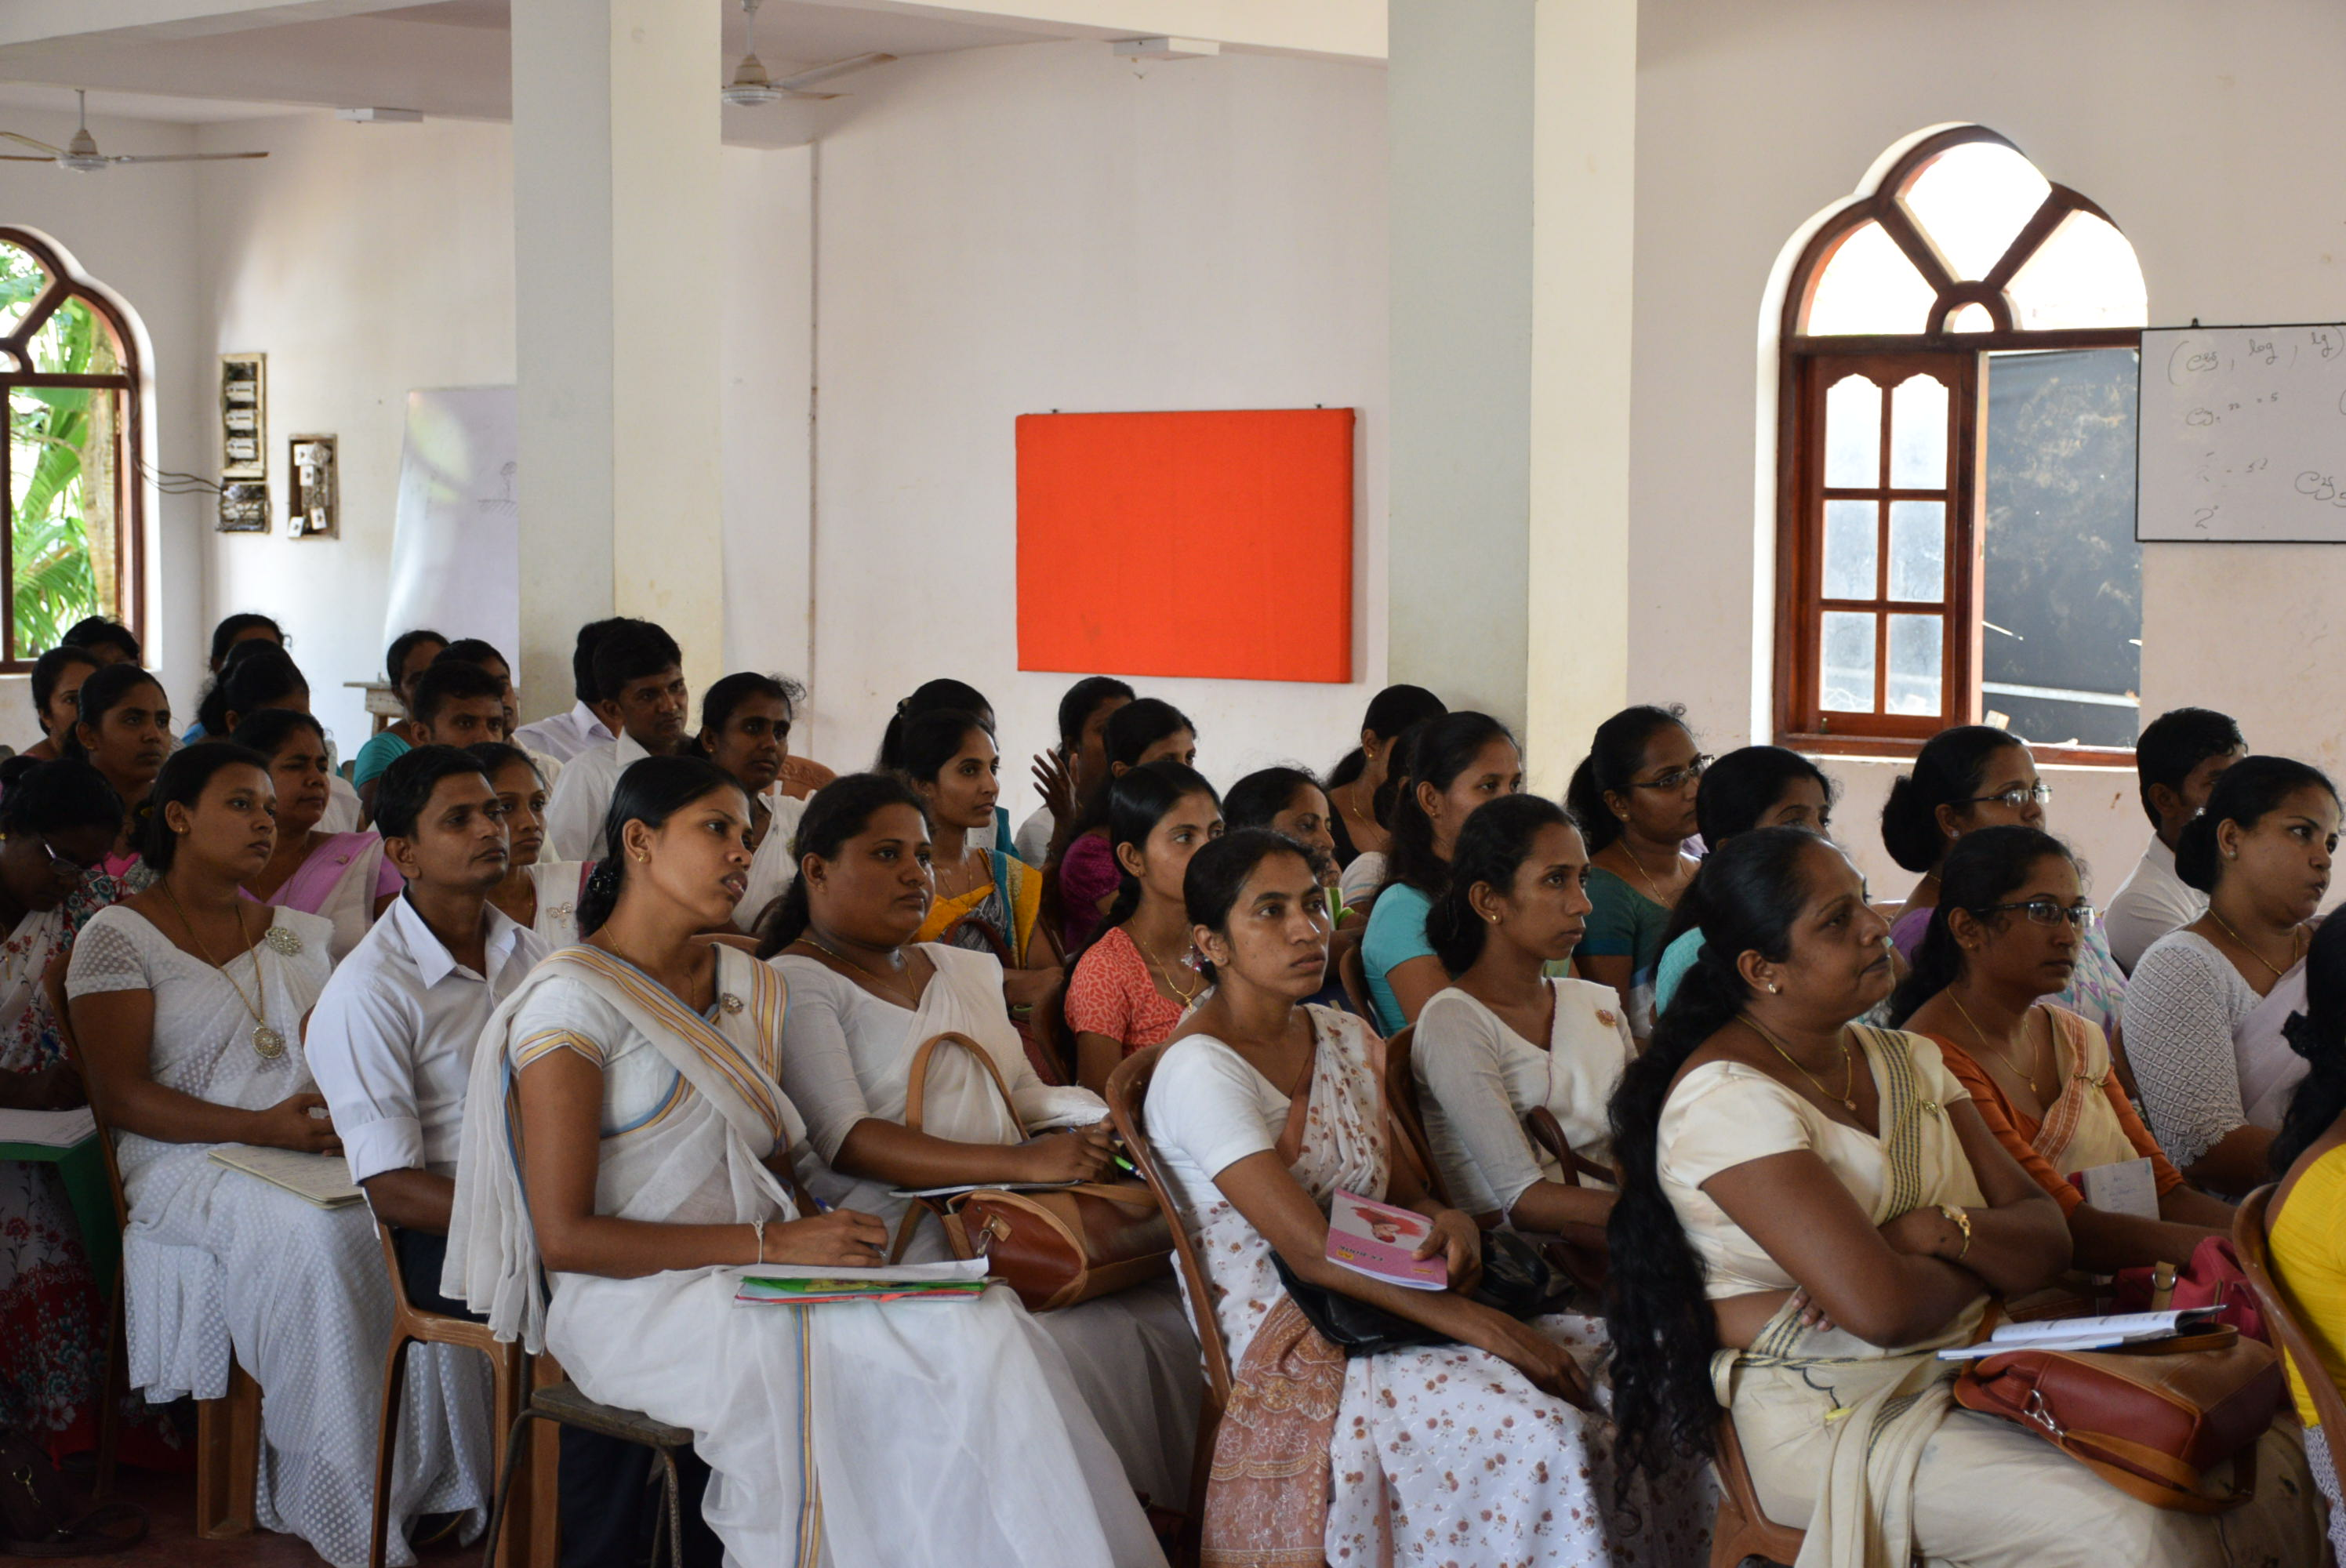 Sati Pasala Mindfulness Programe for Principals and Teachers of Southern Province (7)